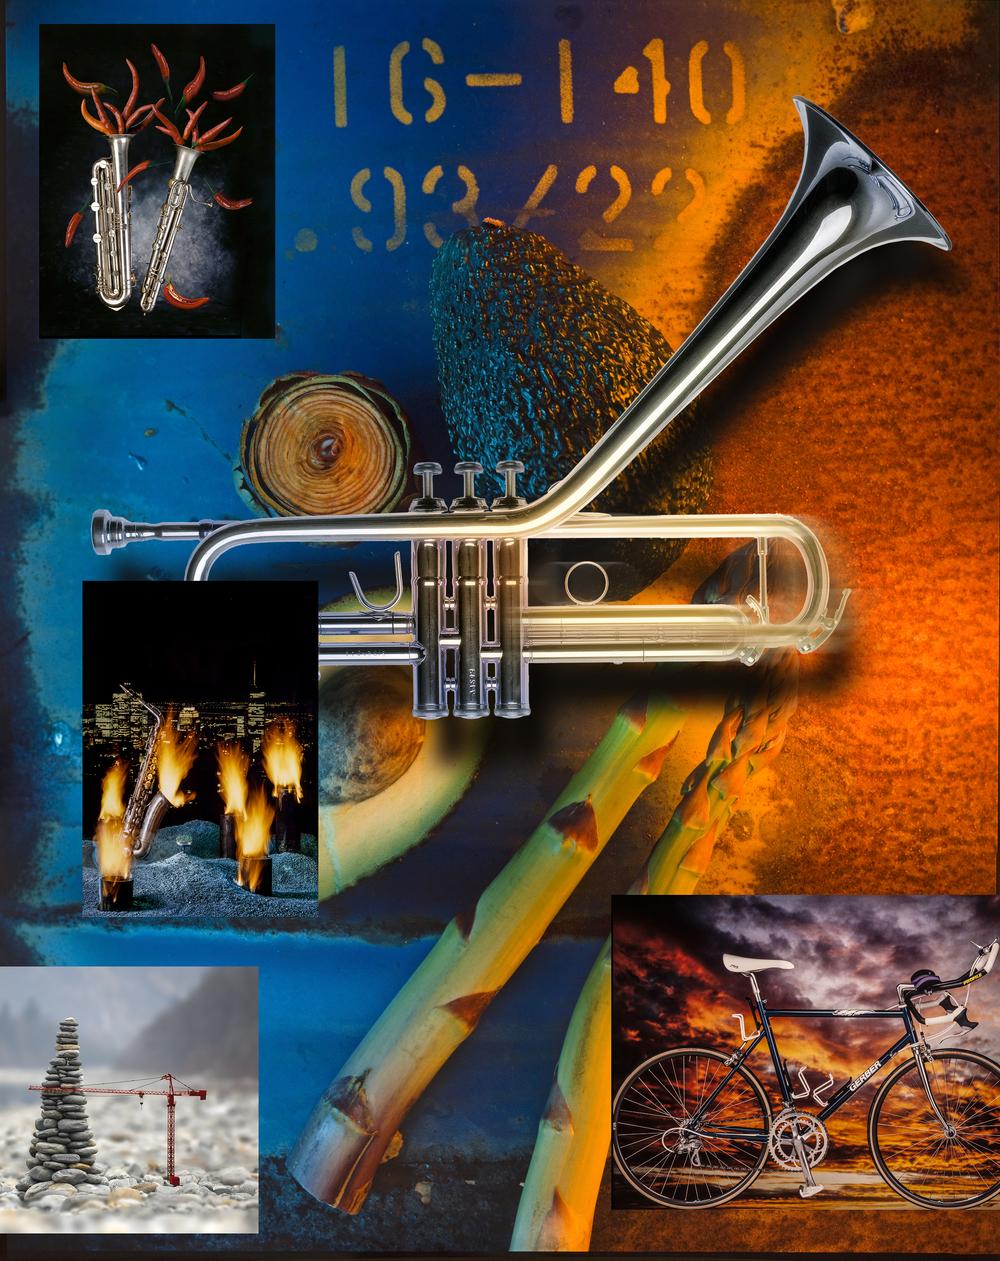 Dizzys trumpet_16-140.jpg